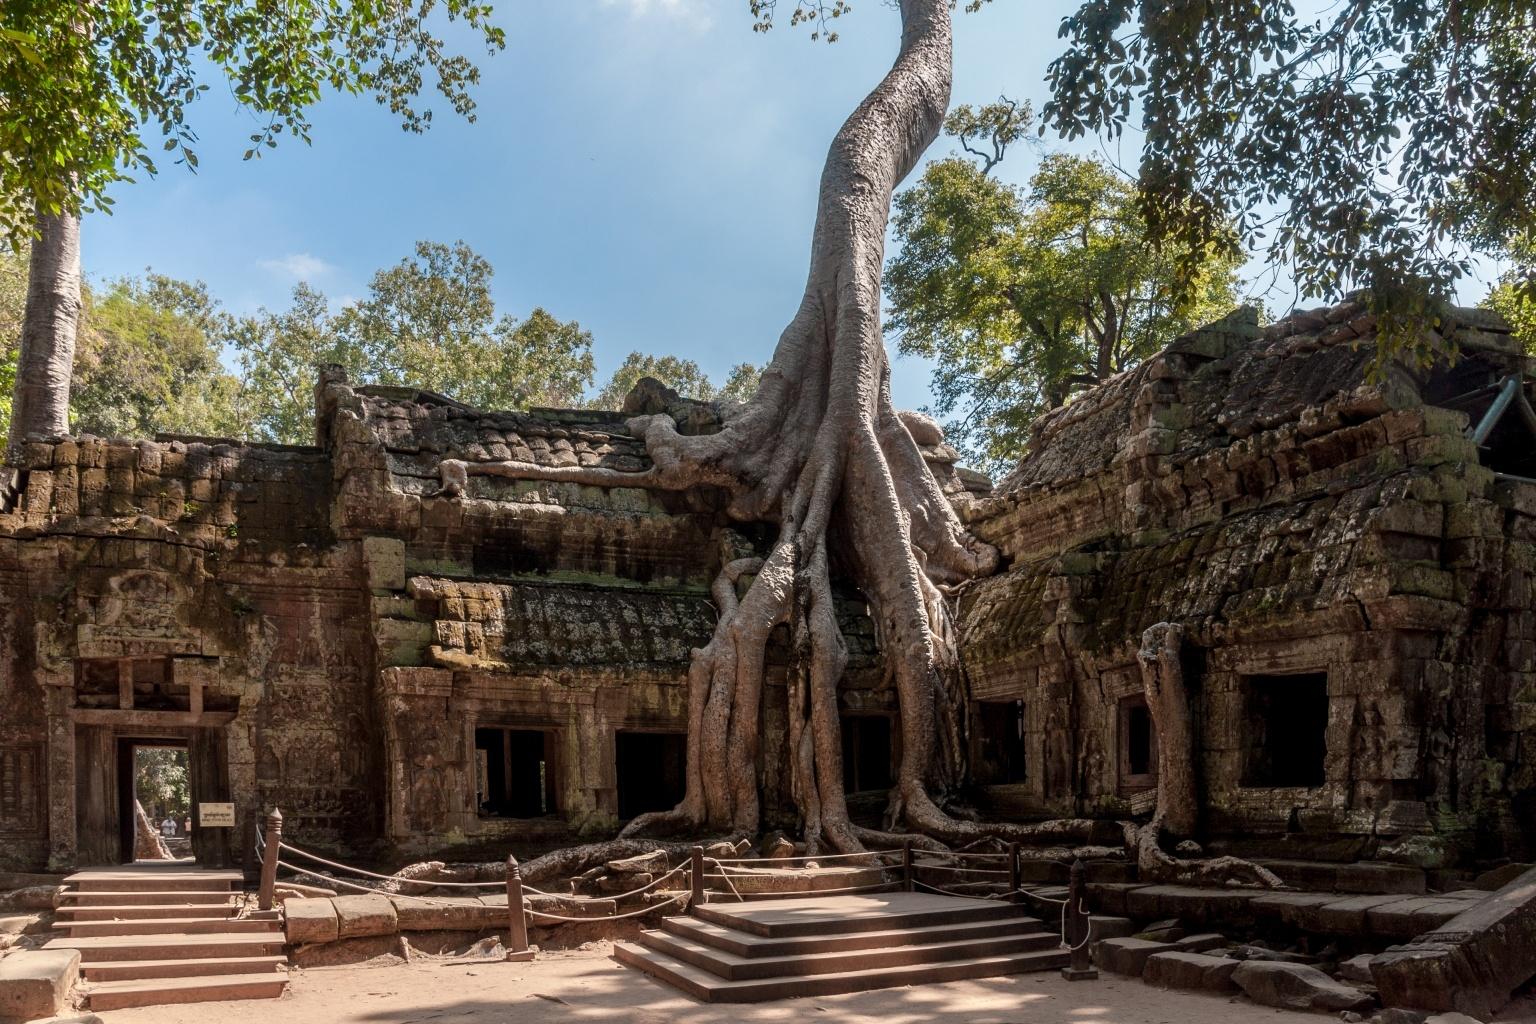 معبد تاپروم کامبوج